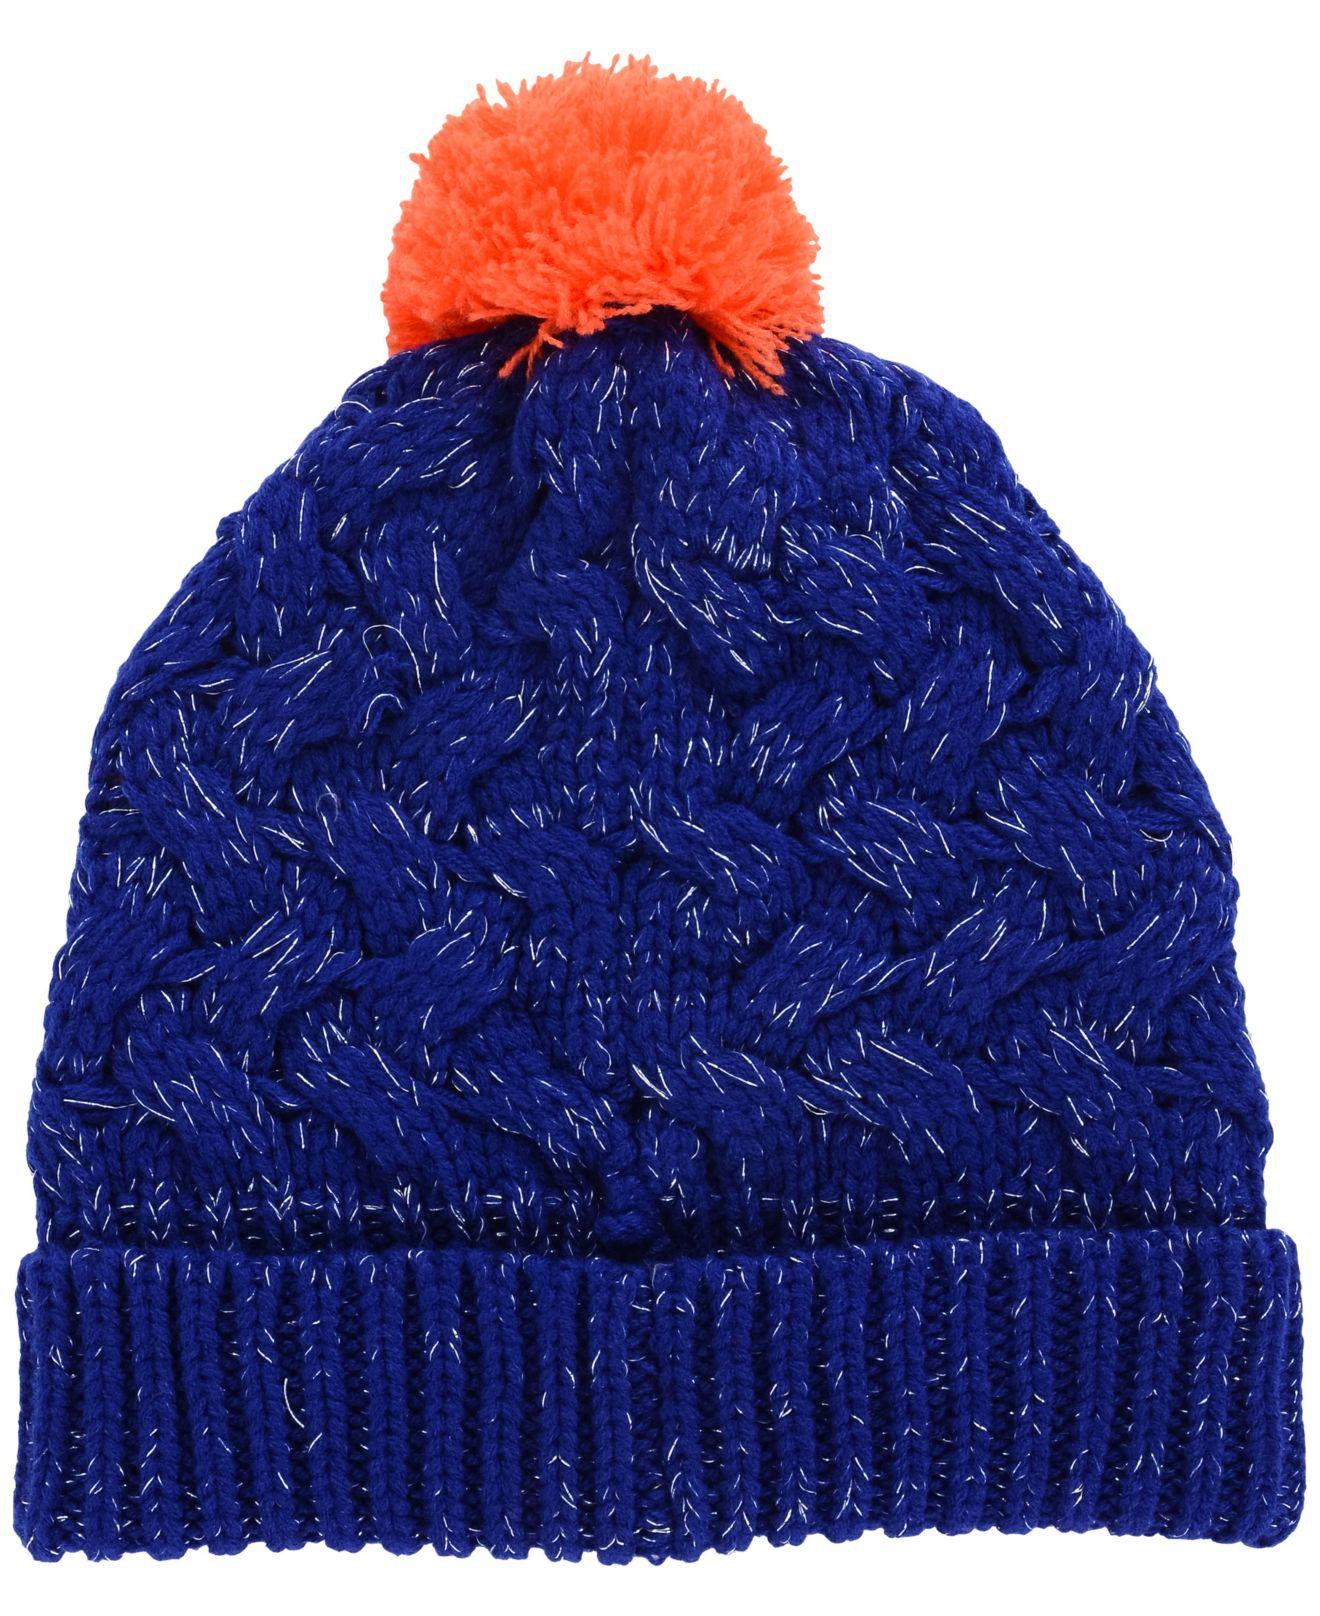 95c394b7b1b ... norway lyst 47 brand womens new york islanders fiona pom knit hat in  blue 0576a 9039e